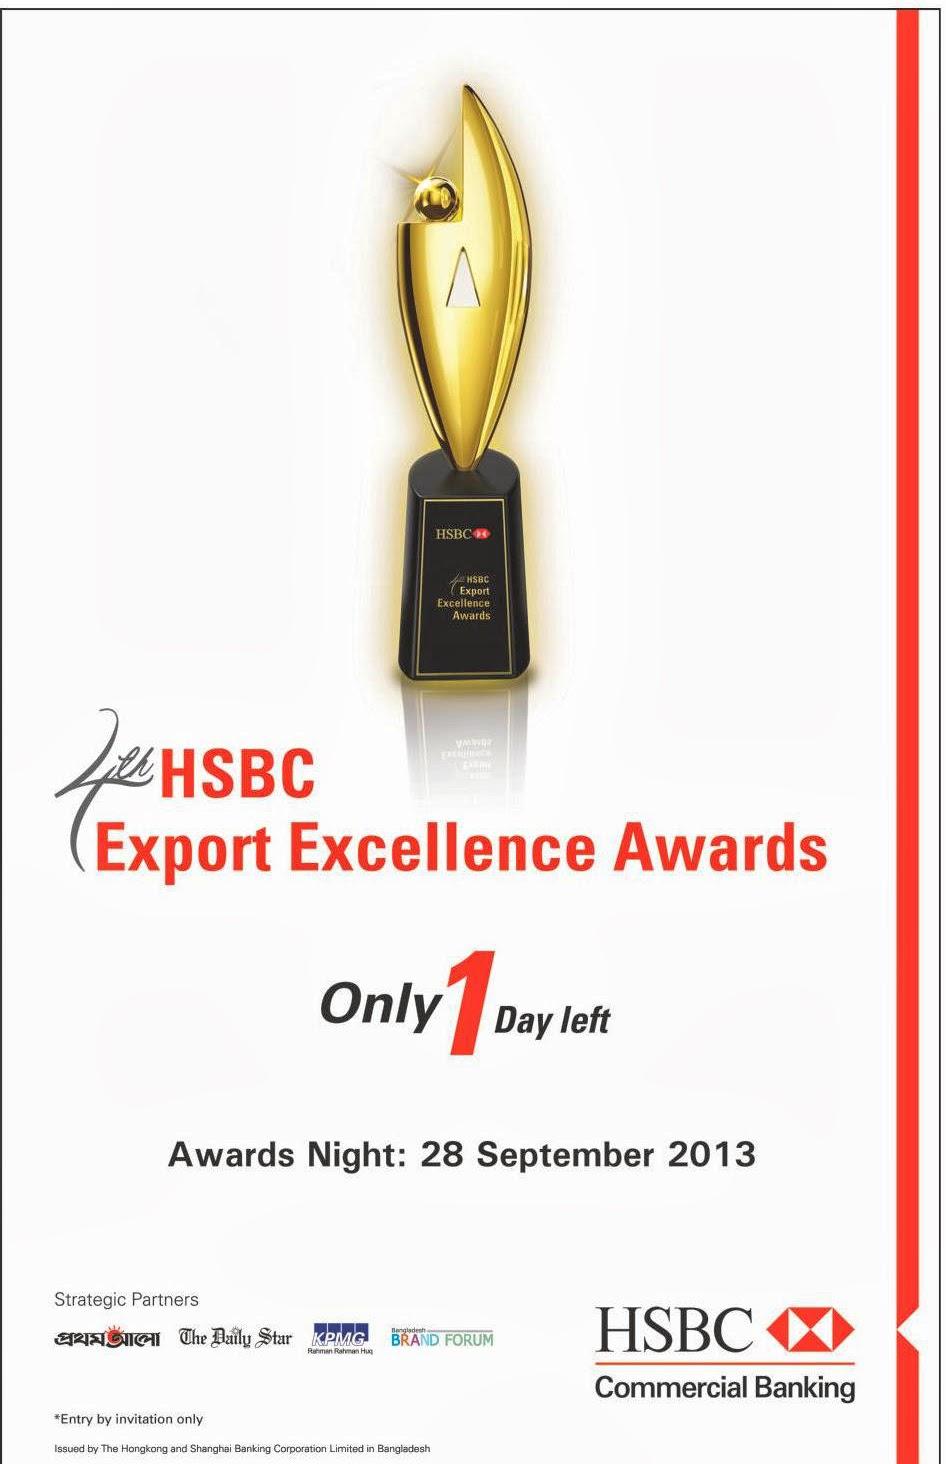 Advertising Archive Bangladesh: HSBC